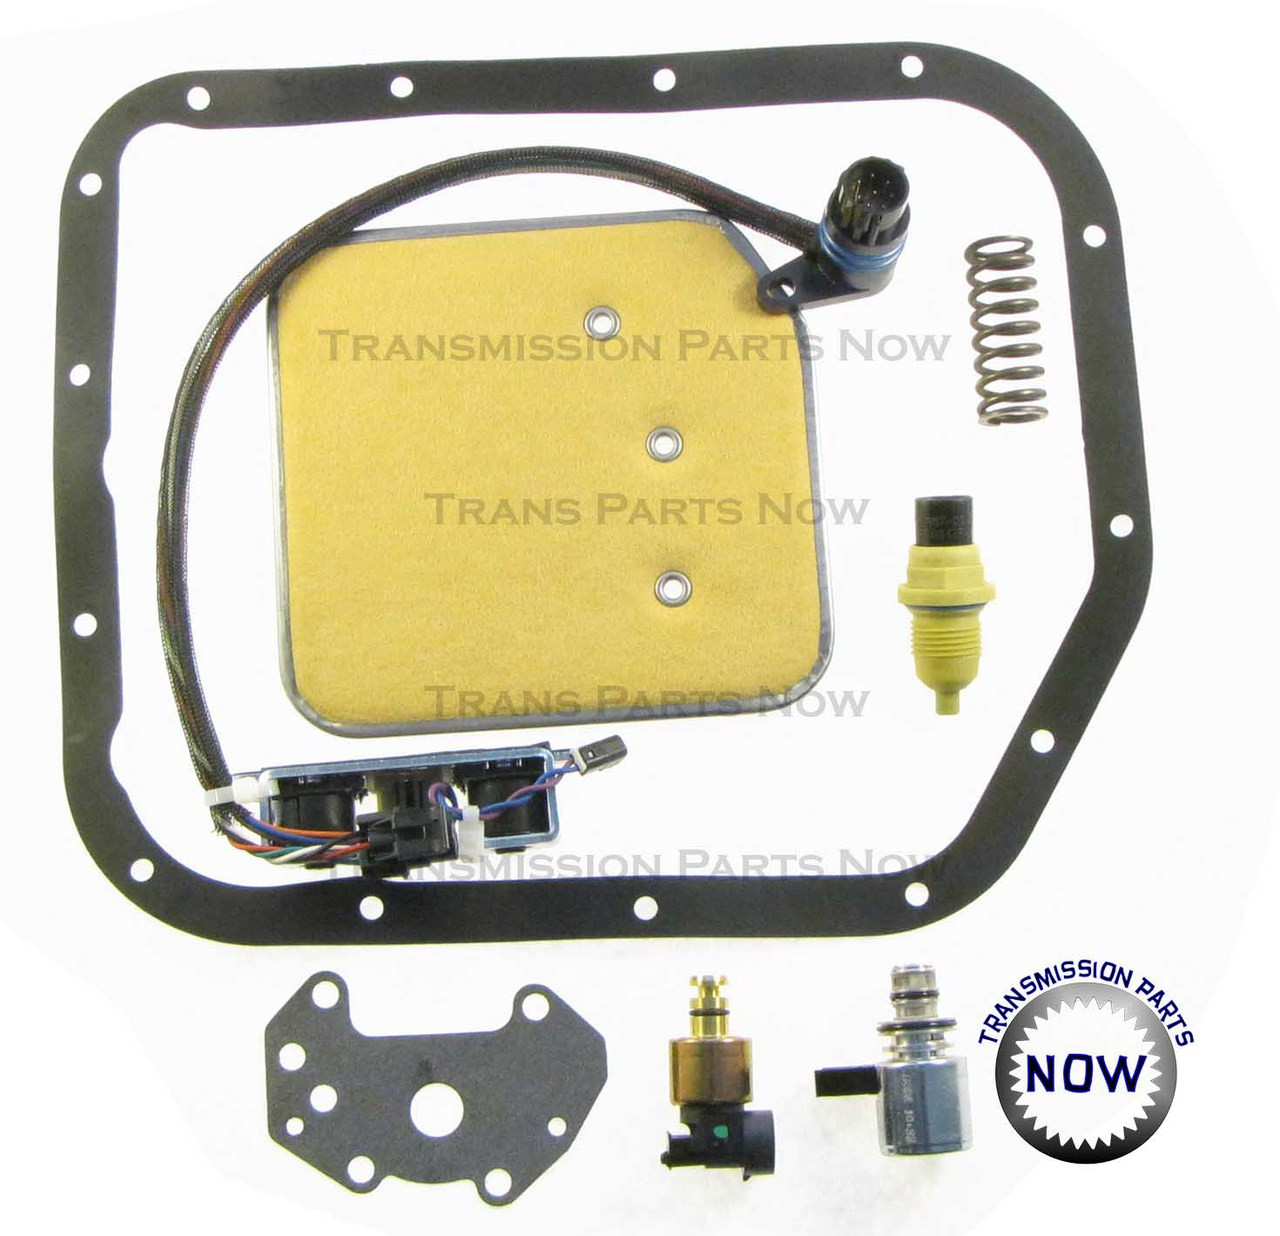 42re transmission rebuild kit